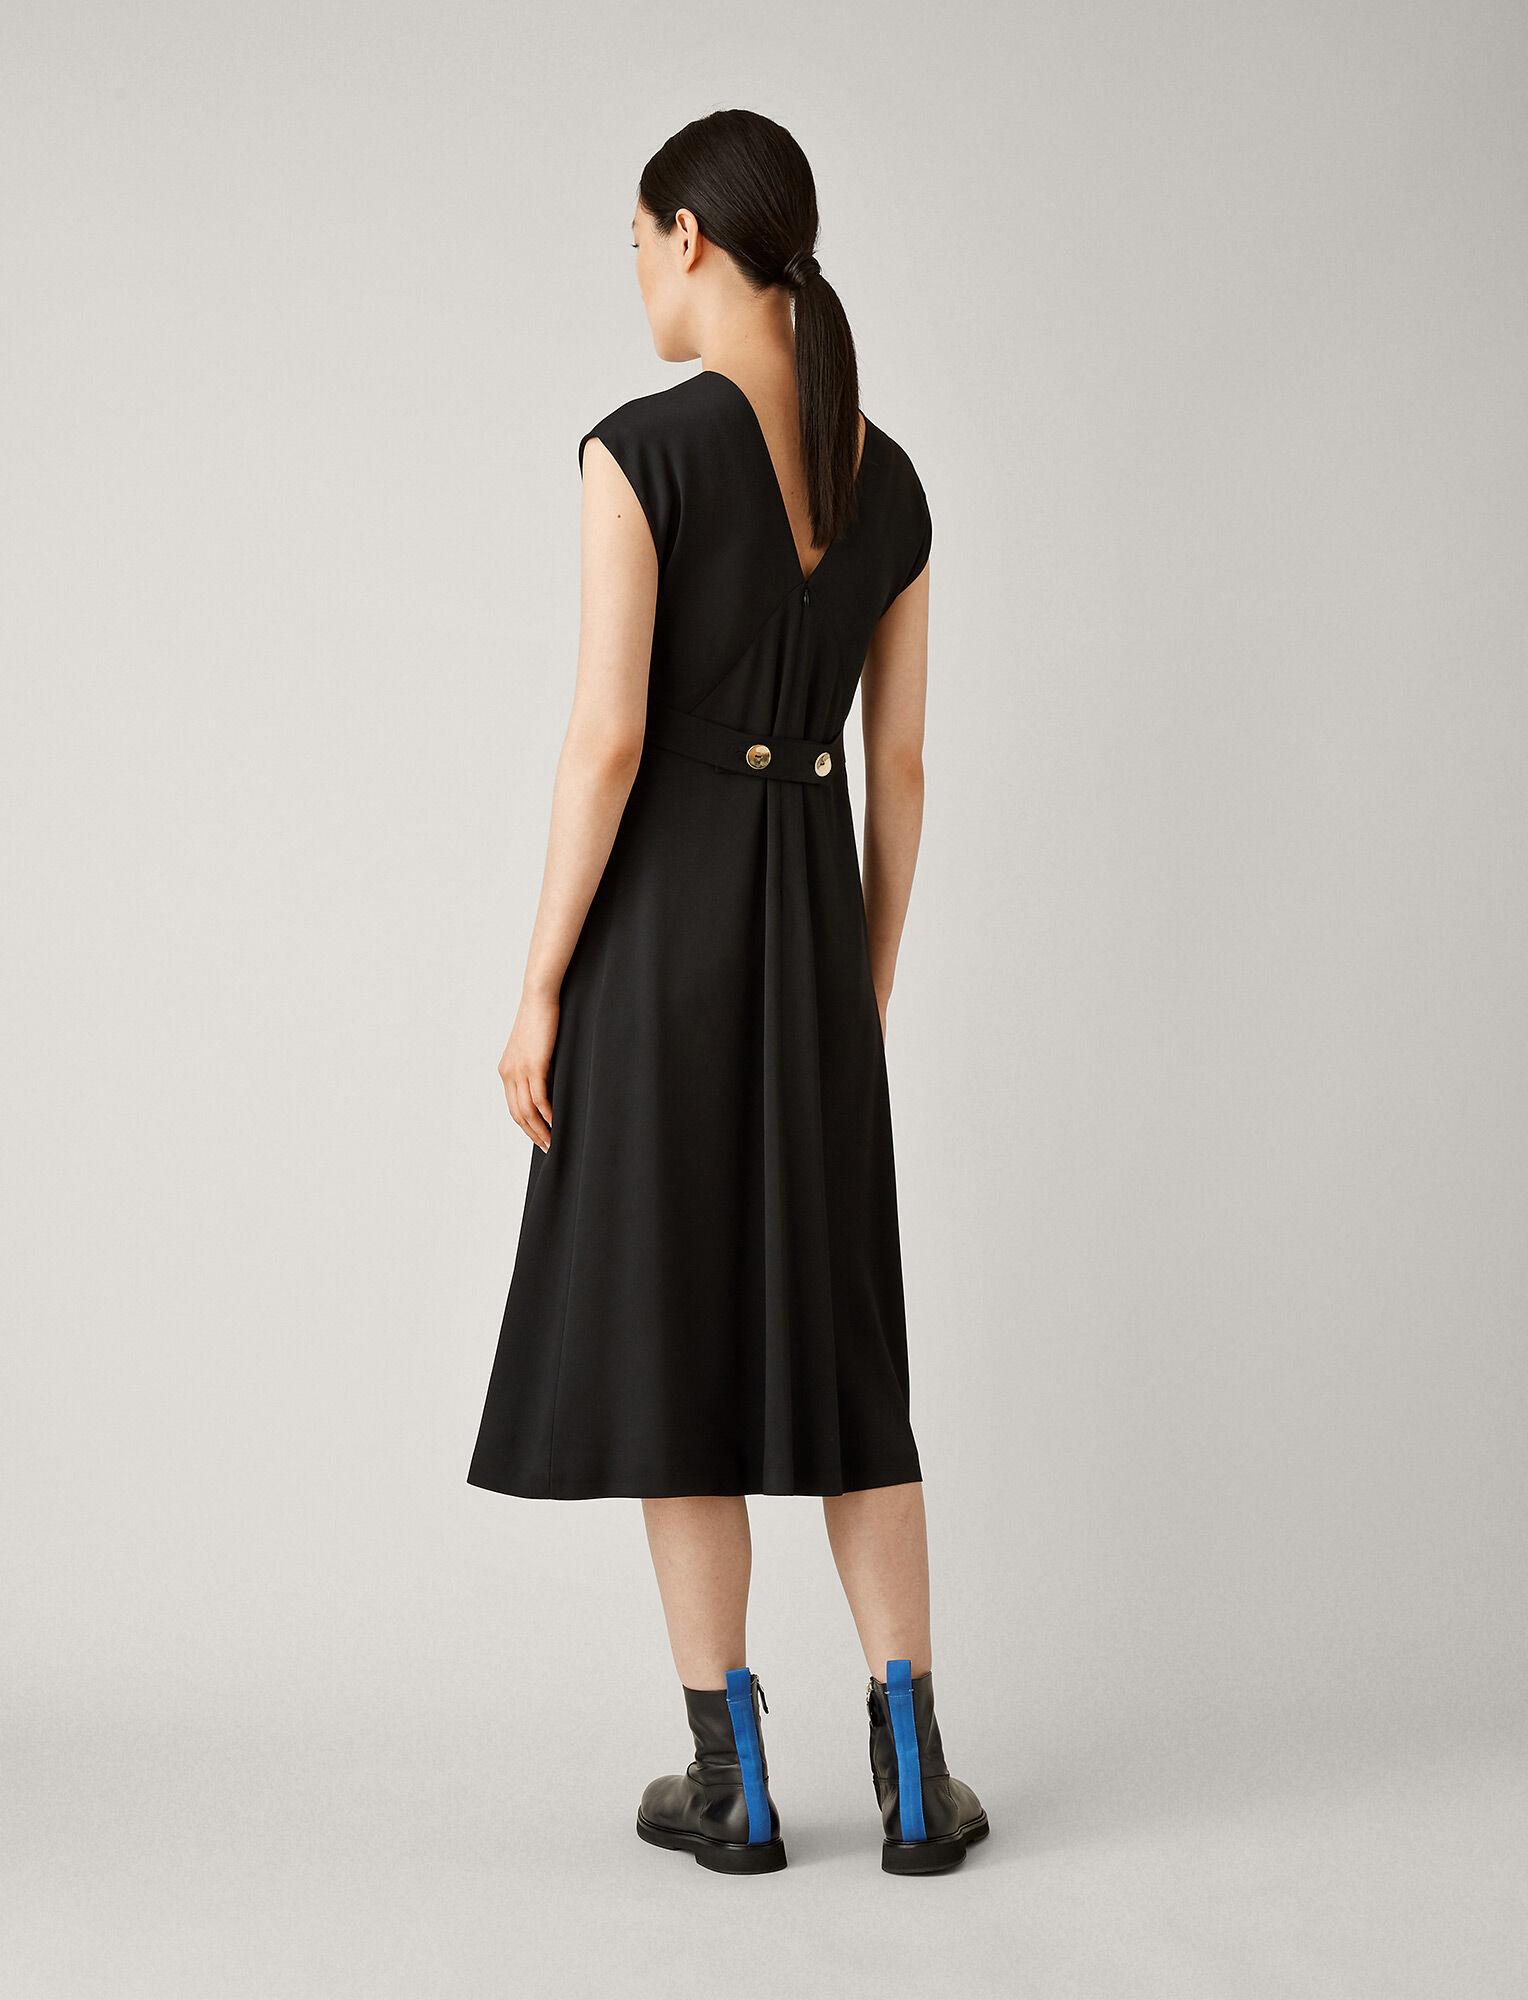 Joseph, Sienna Light Cady Dress, in BLACK